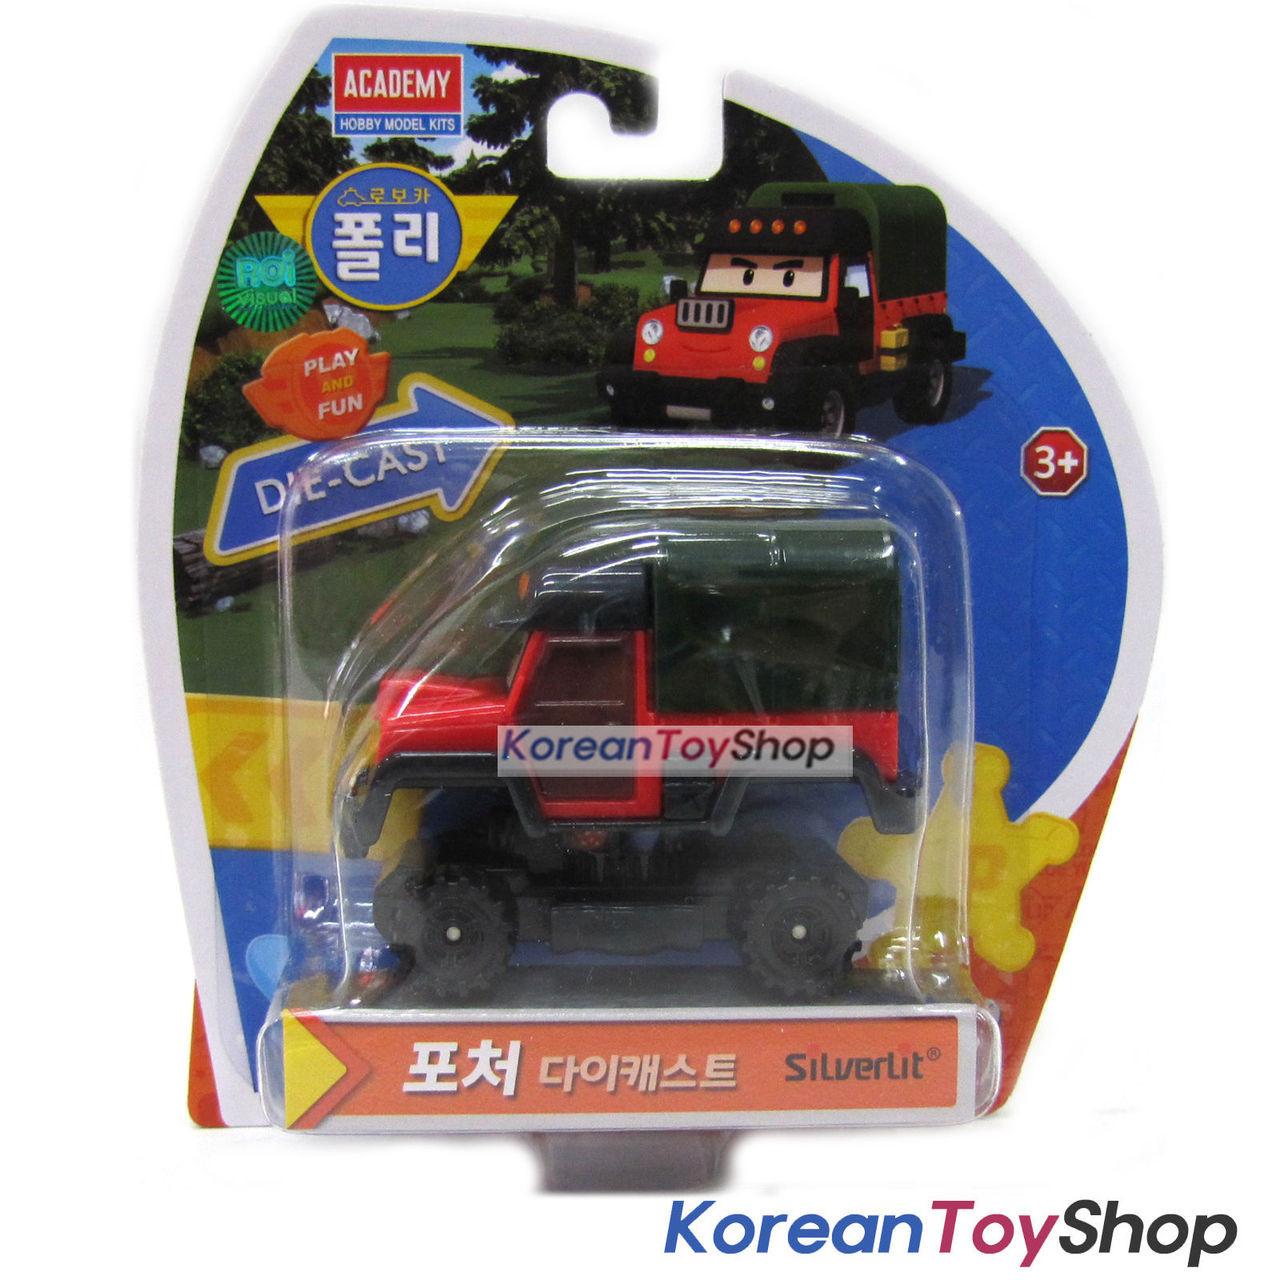 Genuine Silverlit Robocar Poli Diecast Cars Choose any 4 Cars